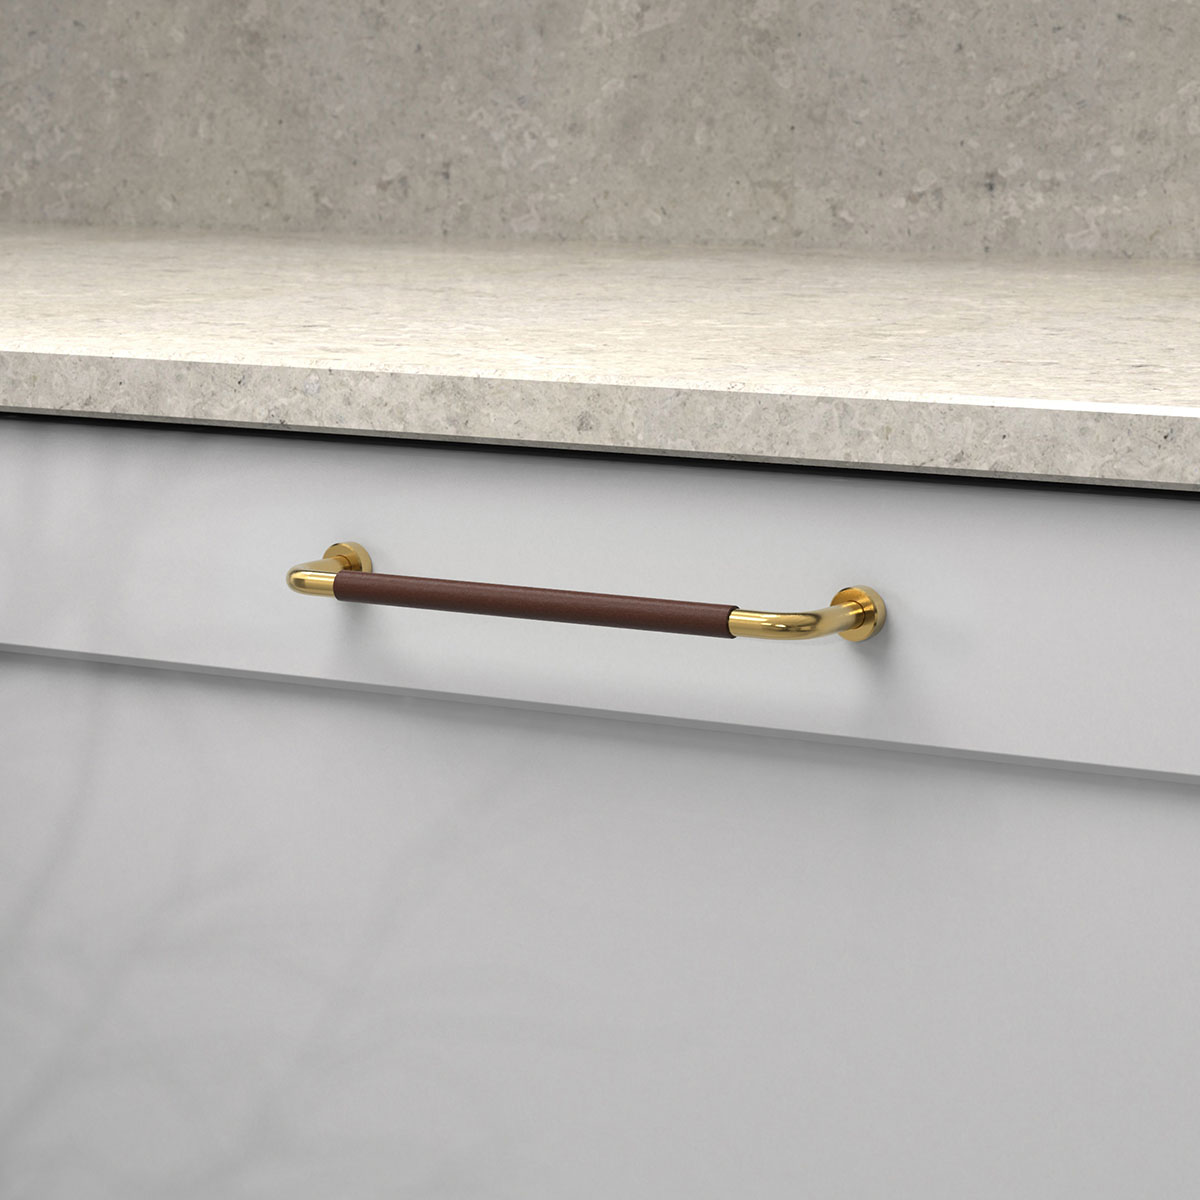 Handtag lounge polerad massing ladersvept brun 370103 11 cc 160 mm ncs s 3000 n kalksten